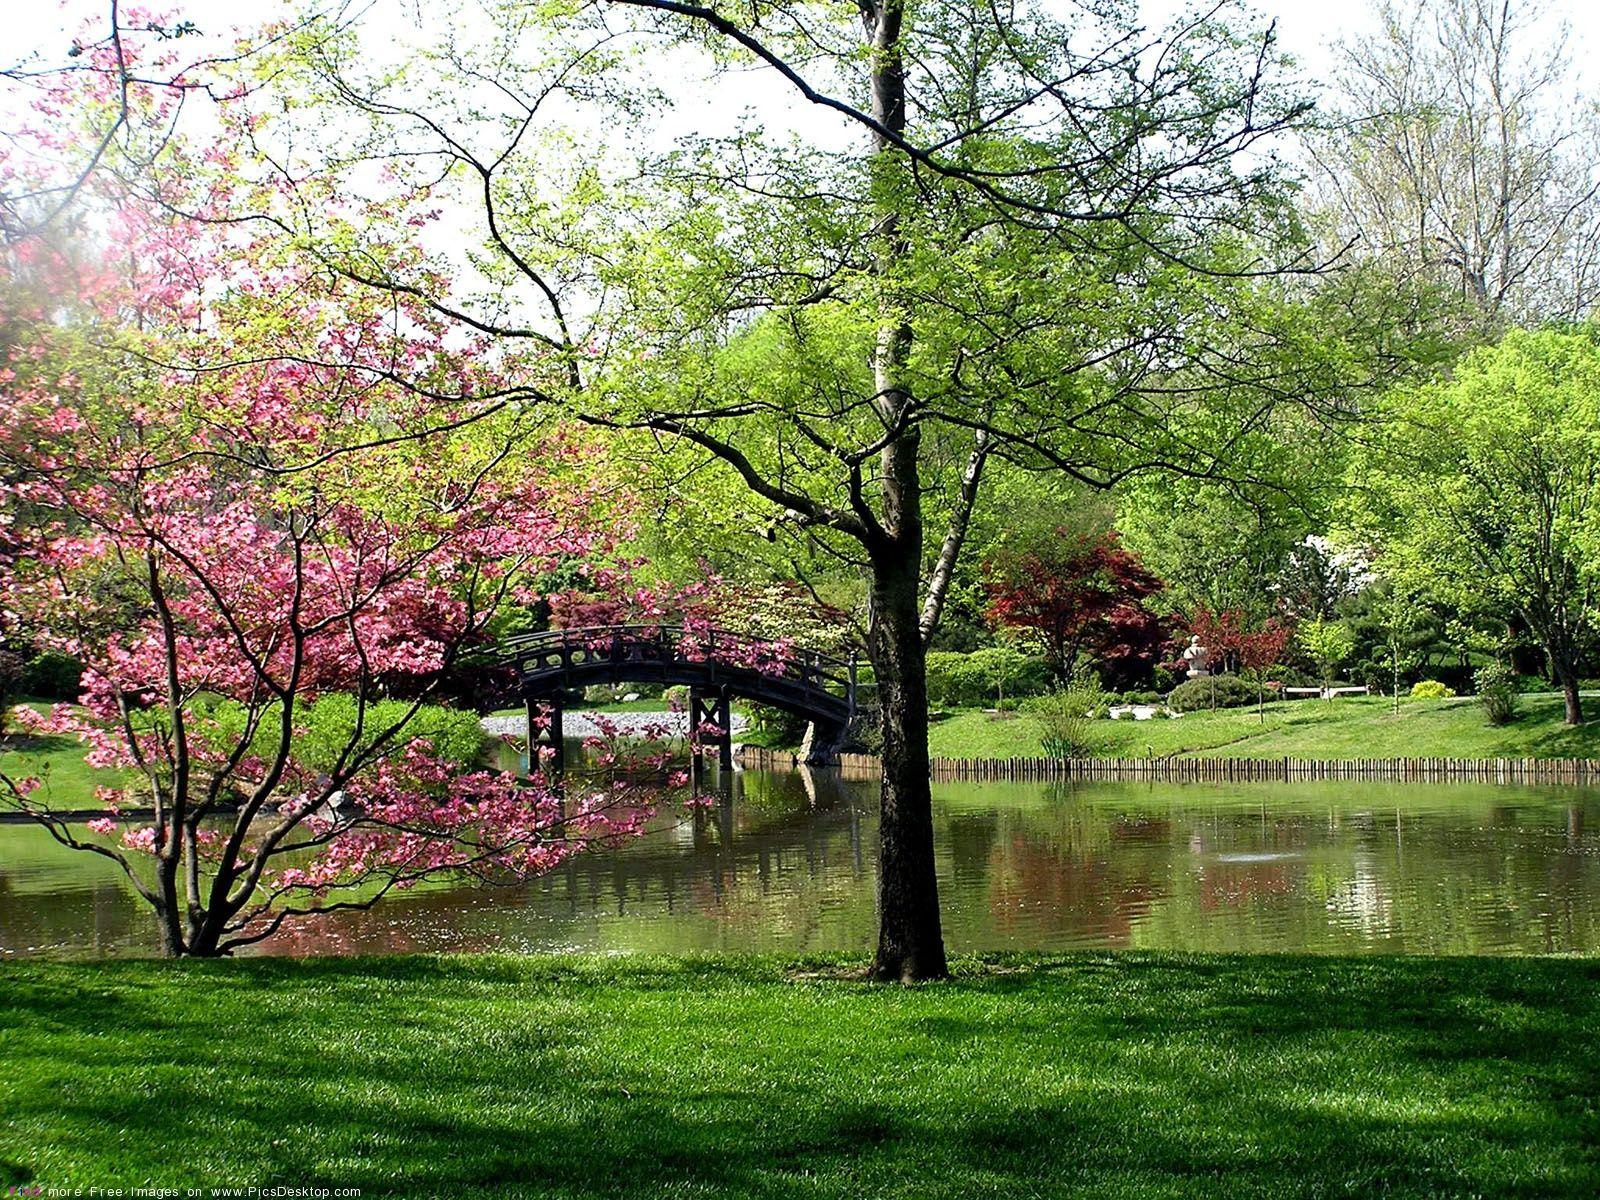 Nature Springtime Free Desktop Wallpapers For Pc Mac 11 Spring Landscape Spring Scenery Nature Wallpaper